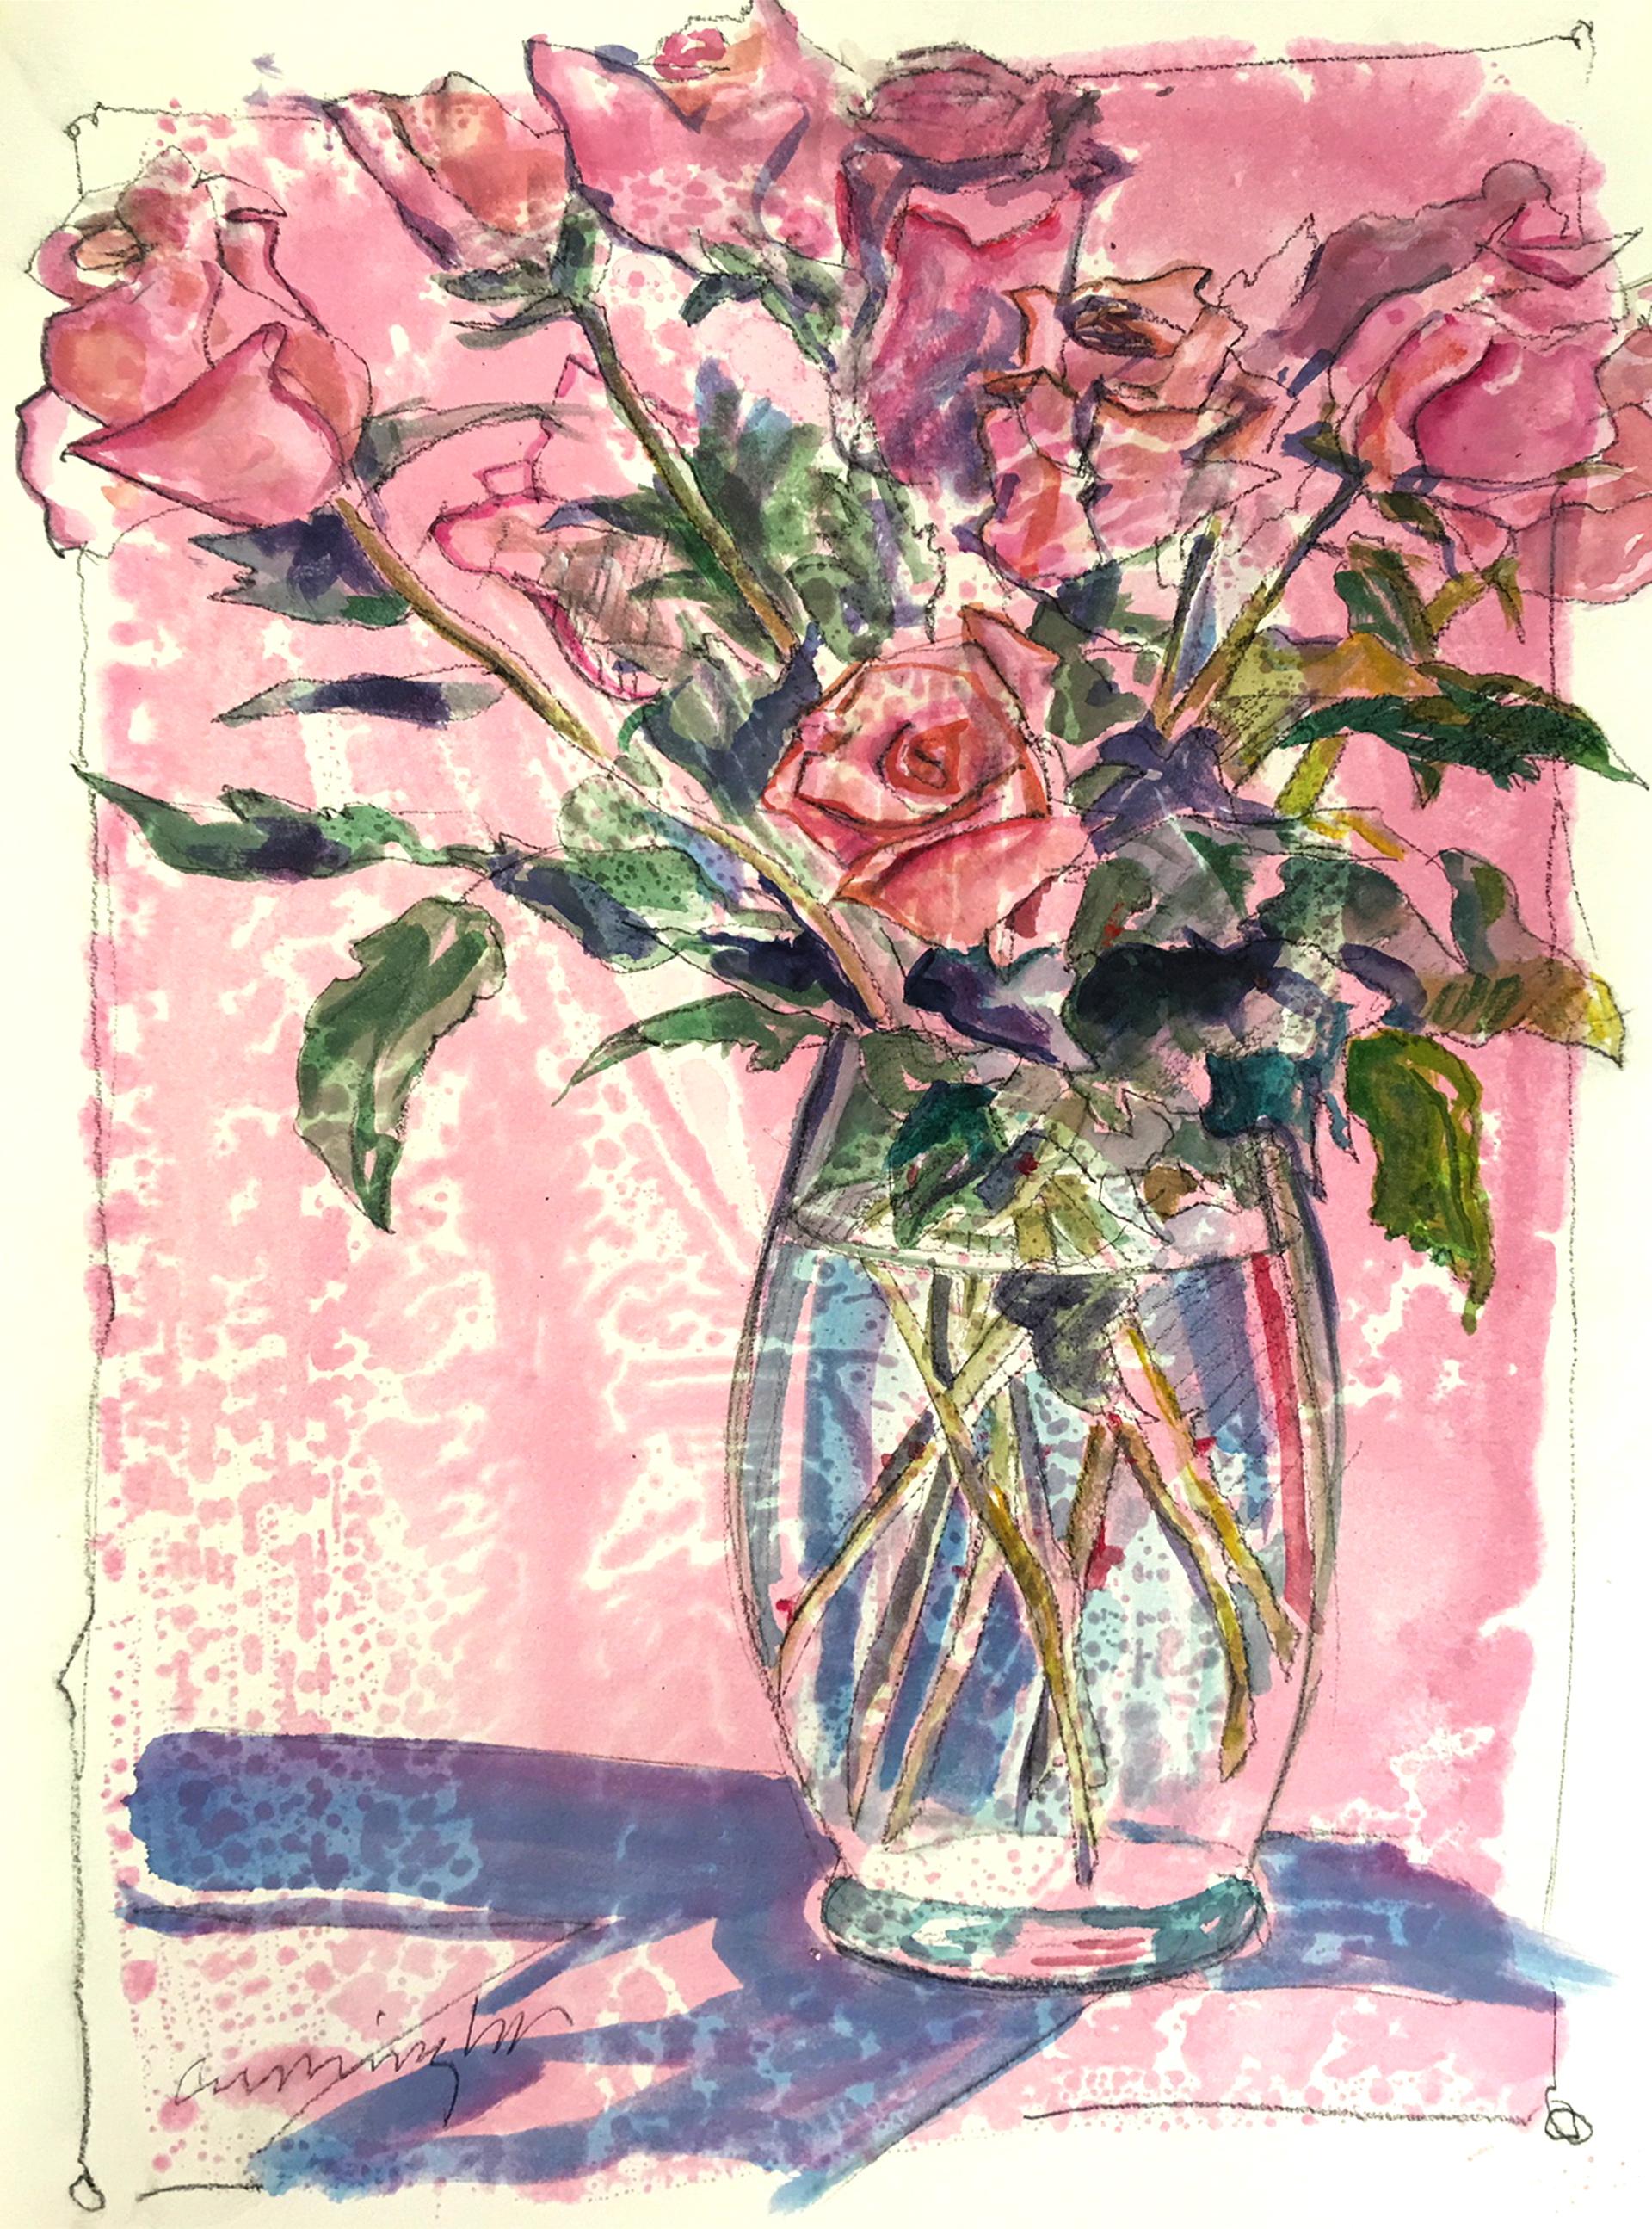 Happy Valentine's Day by Nan Cunningham